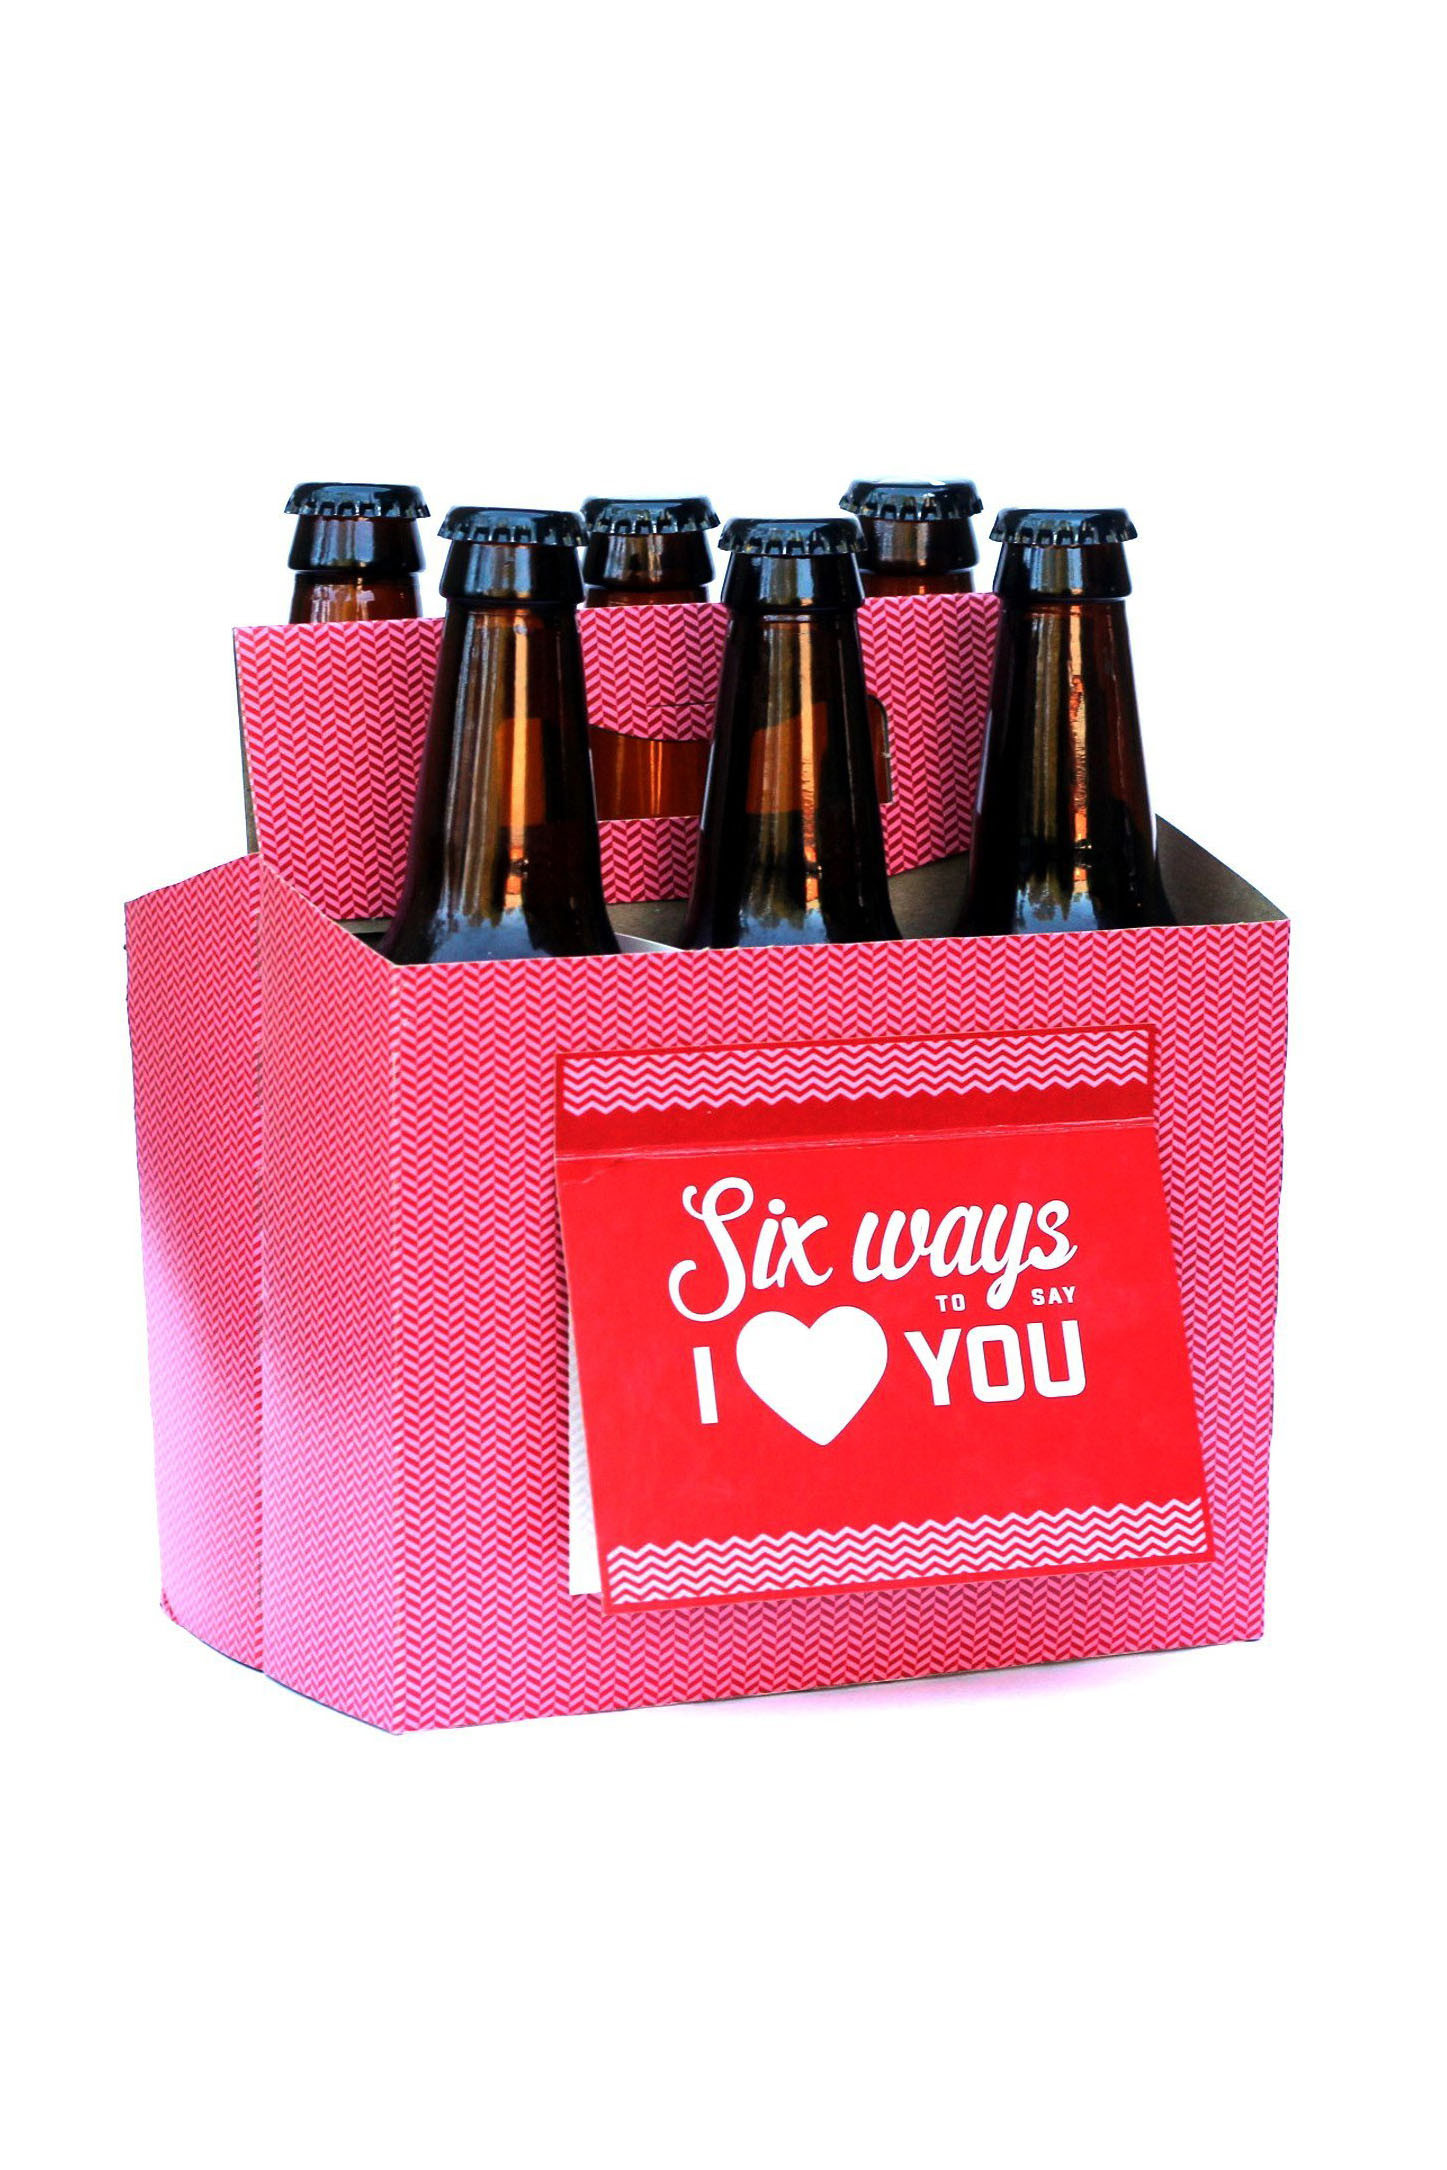 Best Guy Valentines Day Gift Ideas  30 Best Valentine s Day Gifts for Him 2017 Good Ideas